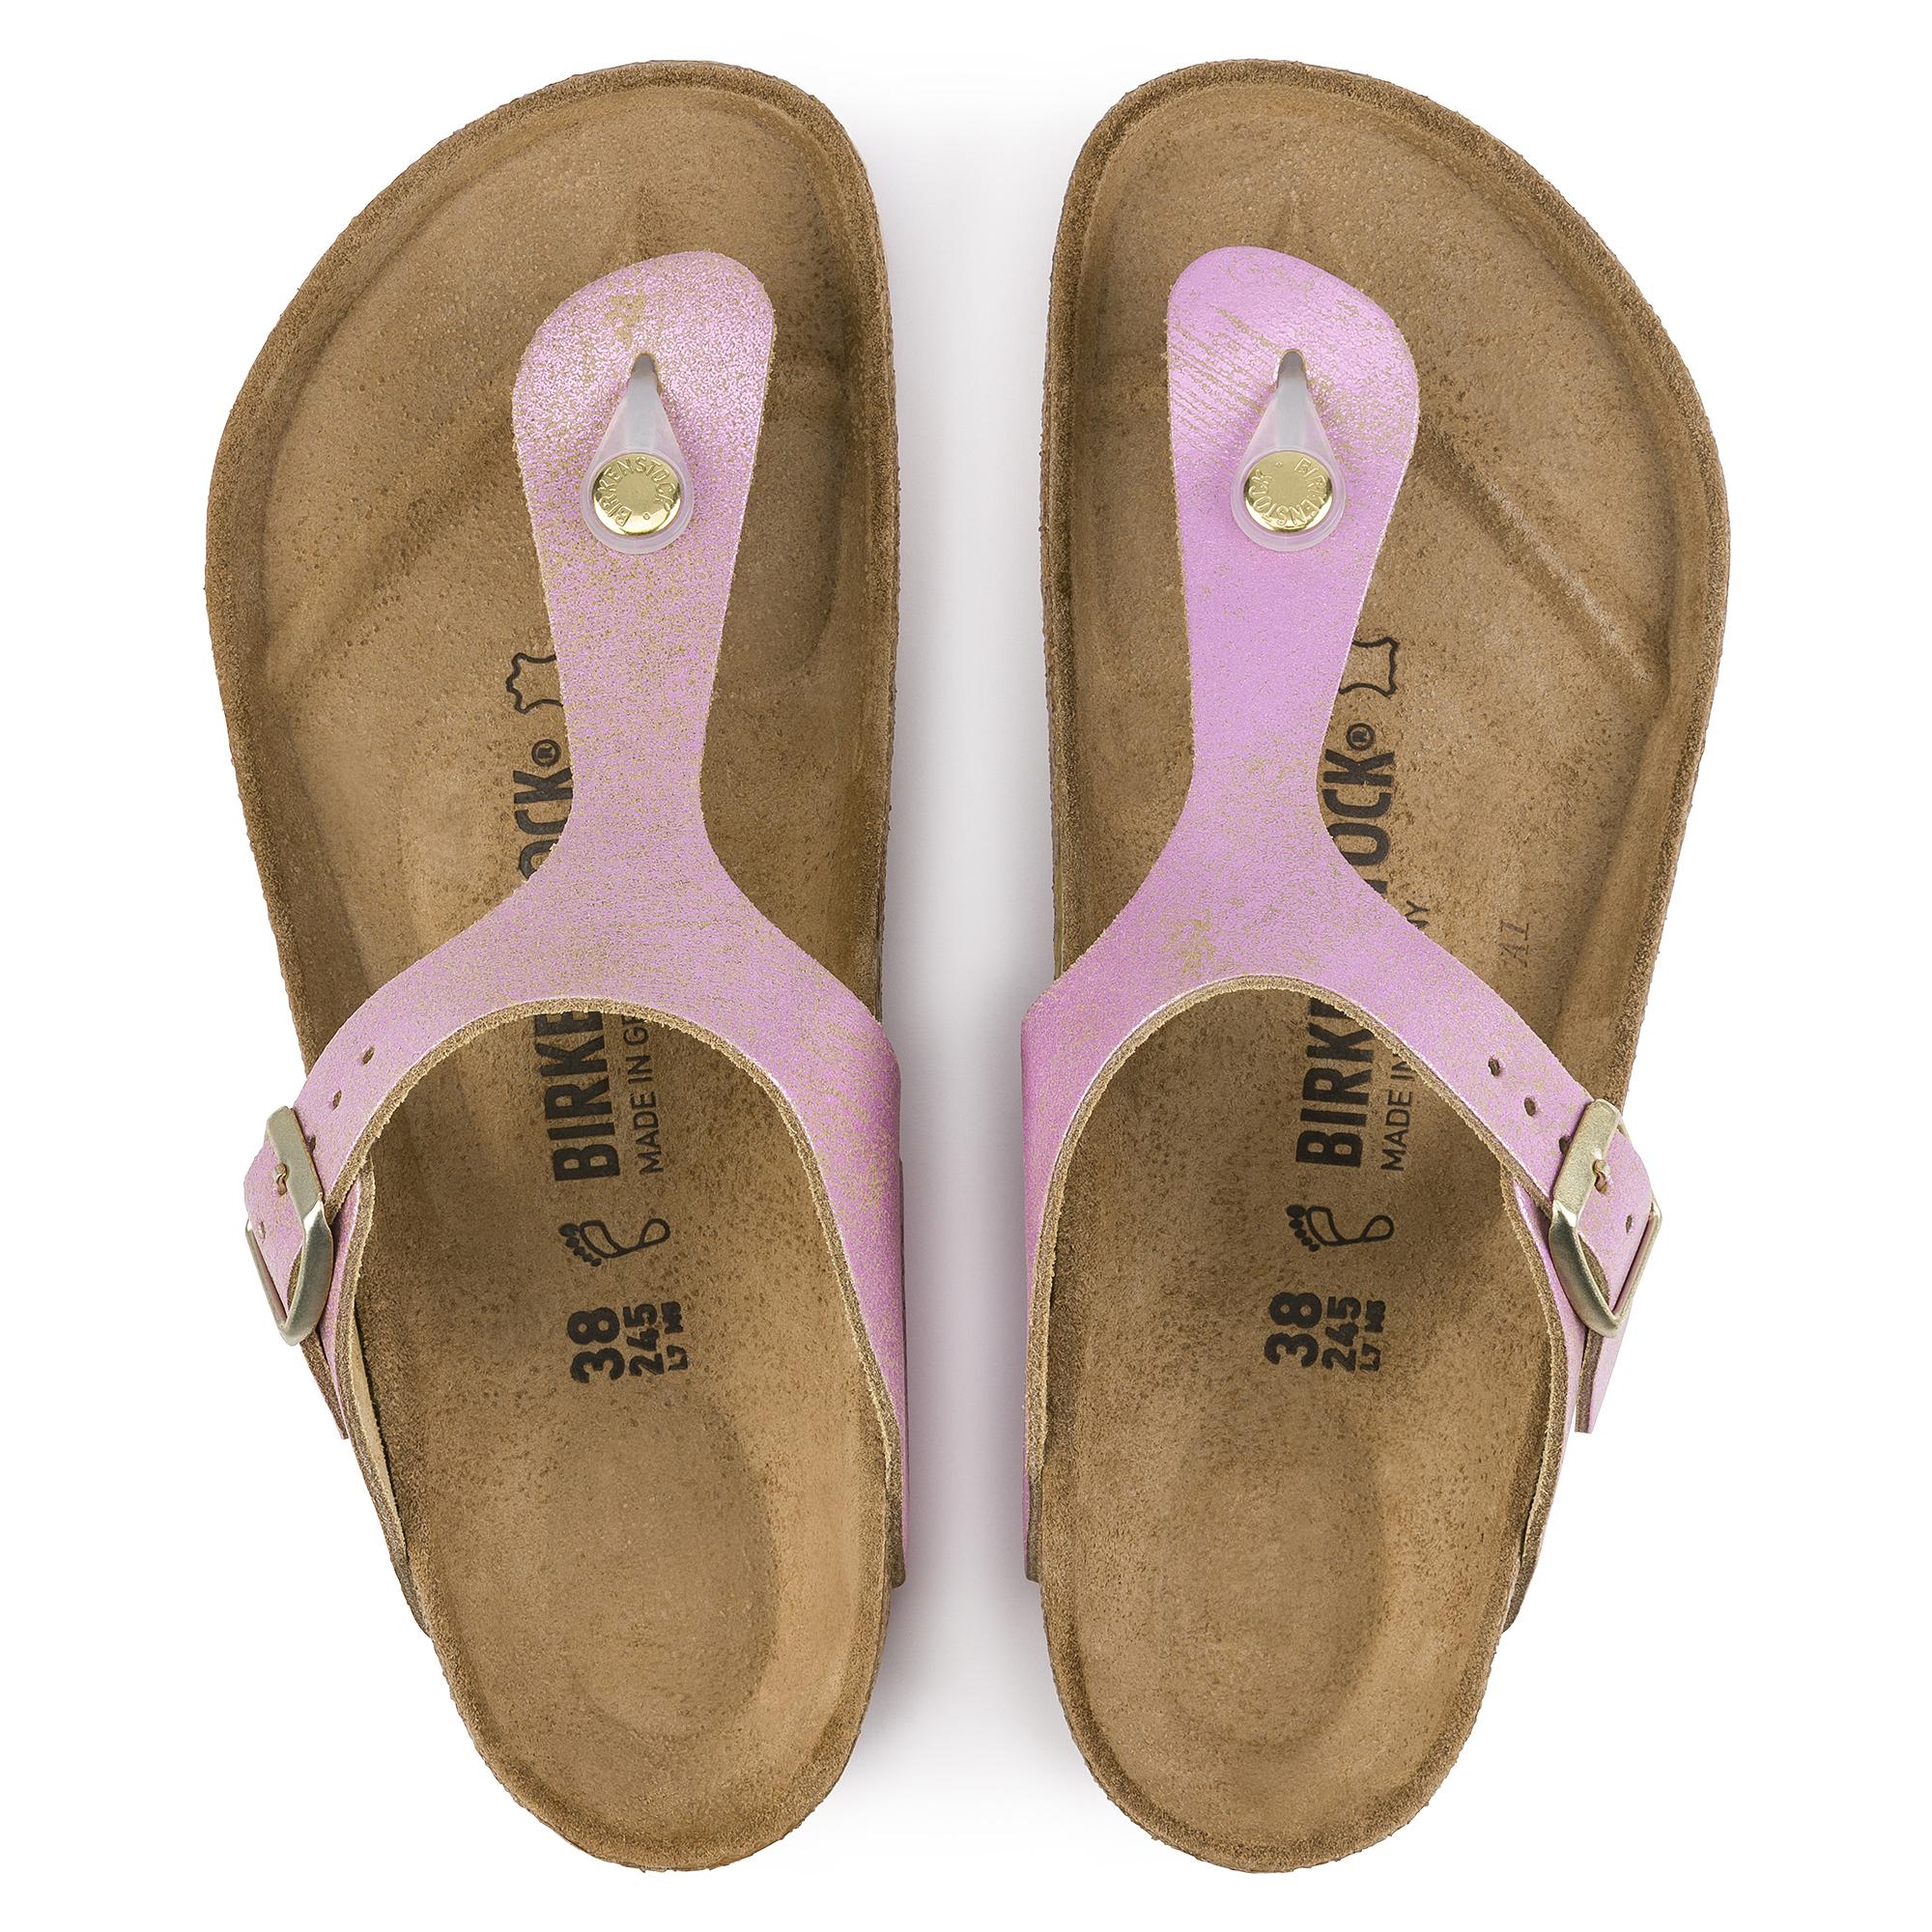 New Birkenstock Gizeh pink metallic sandal 39